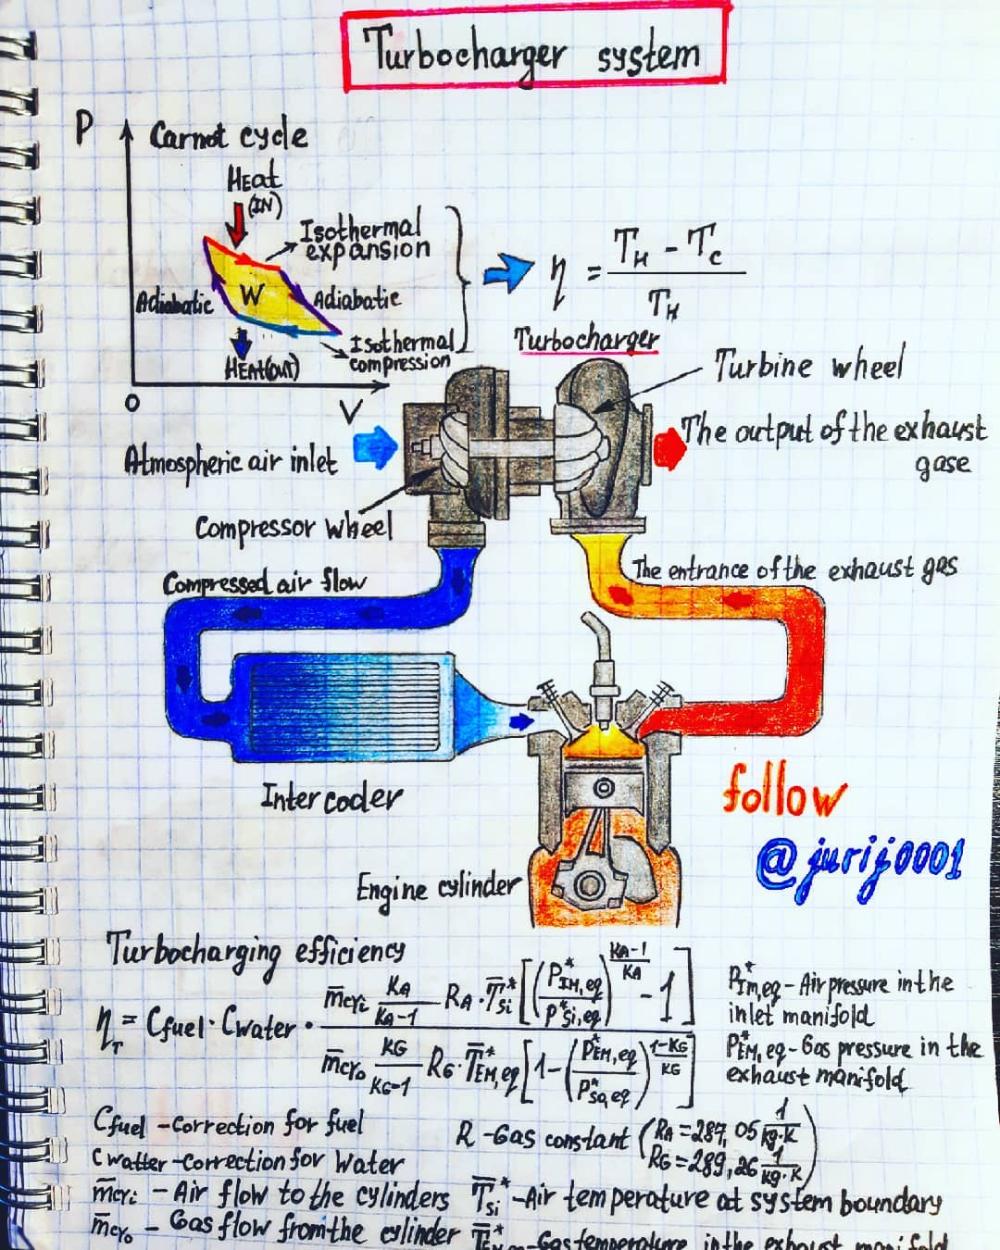 Turbocharger System Illustration Source Jurij0001 Physics And Mathematics Mechanical Engineering Modern Physics